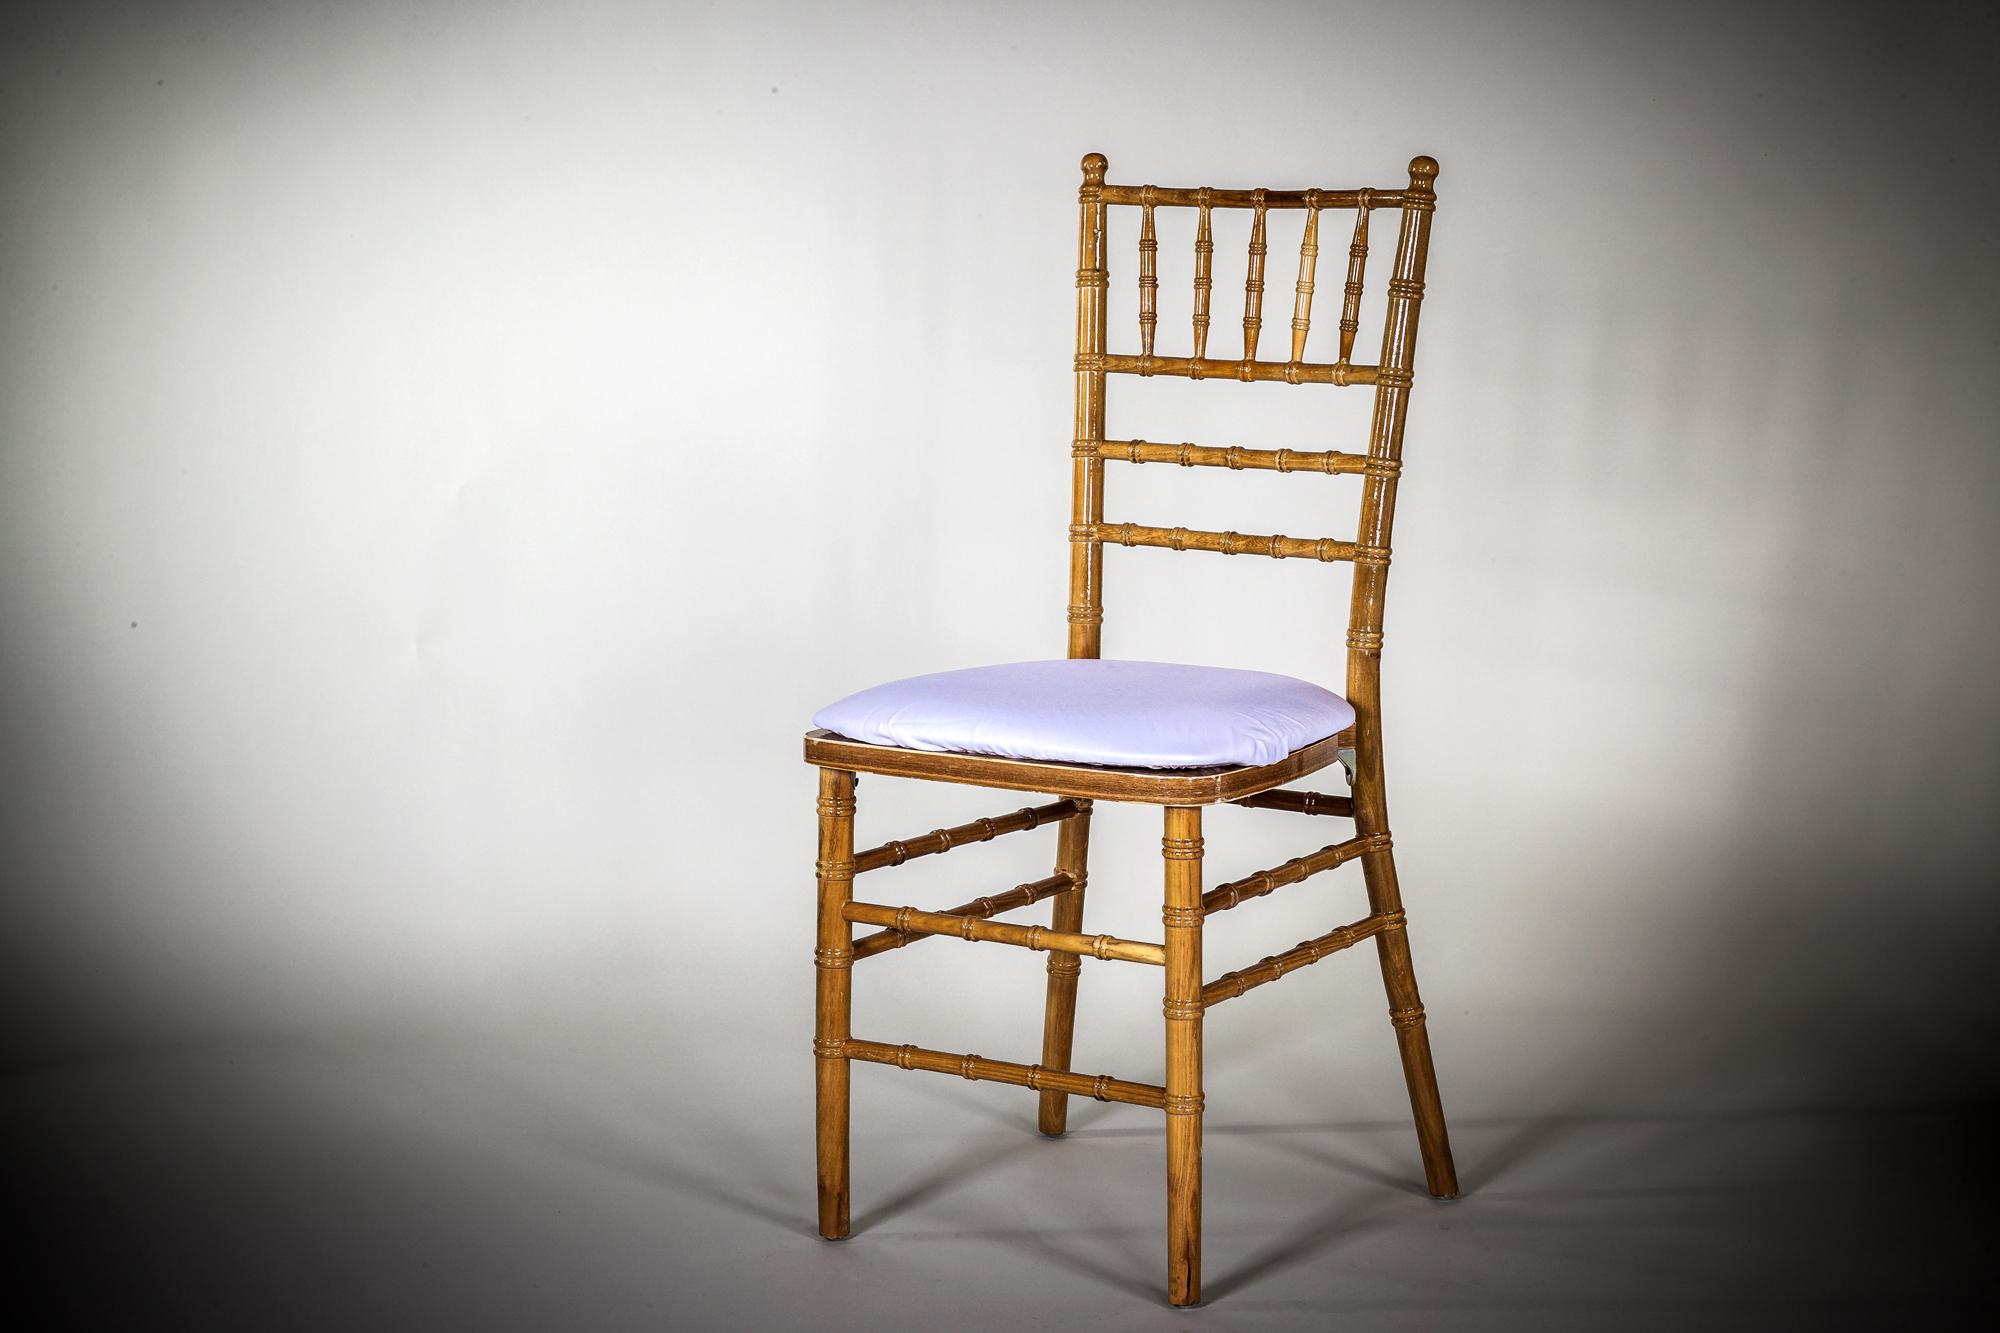 natural chiavari chairs club chair covers canada am party rentals